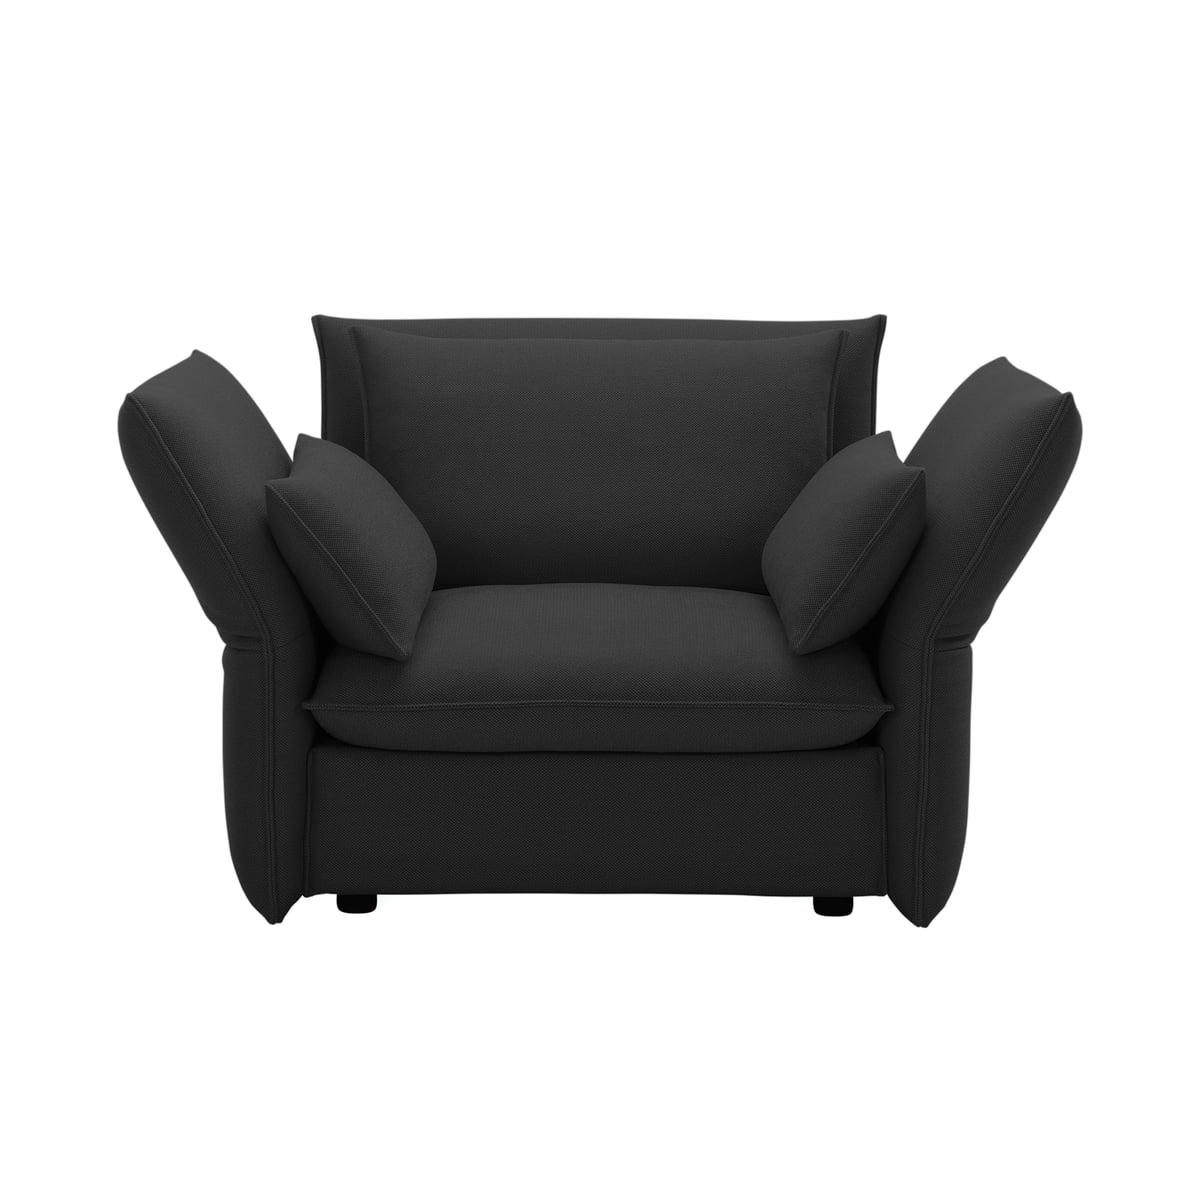 Mariposa Love Seat By Vitra In Laser Dark Grey